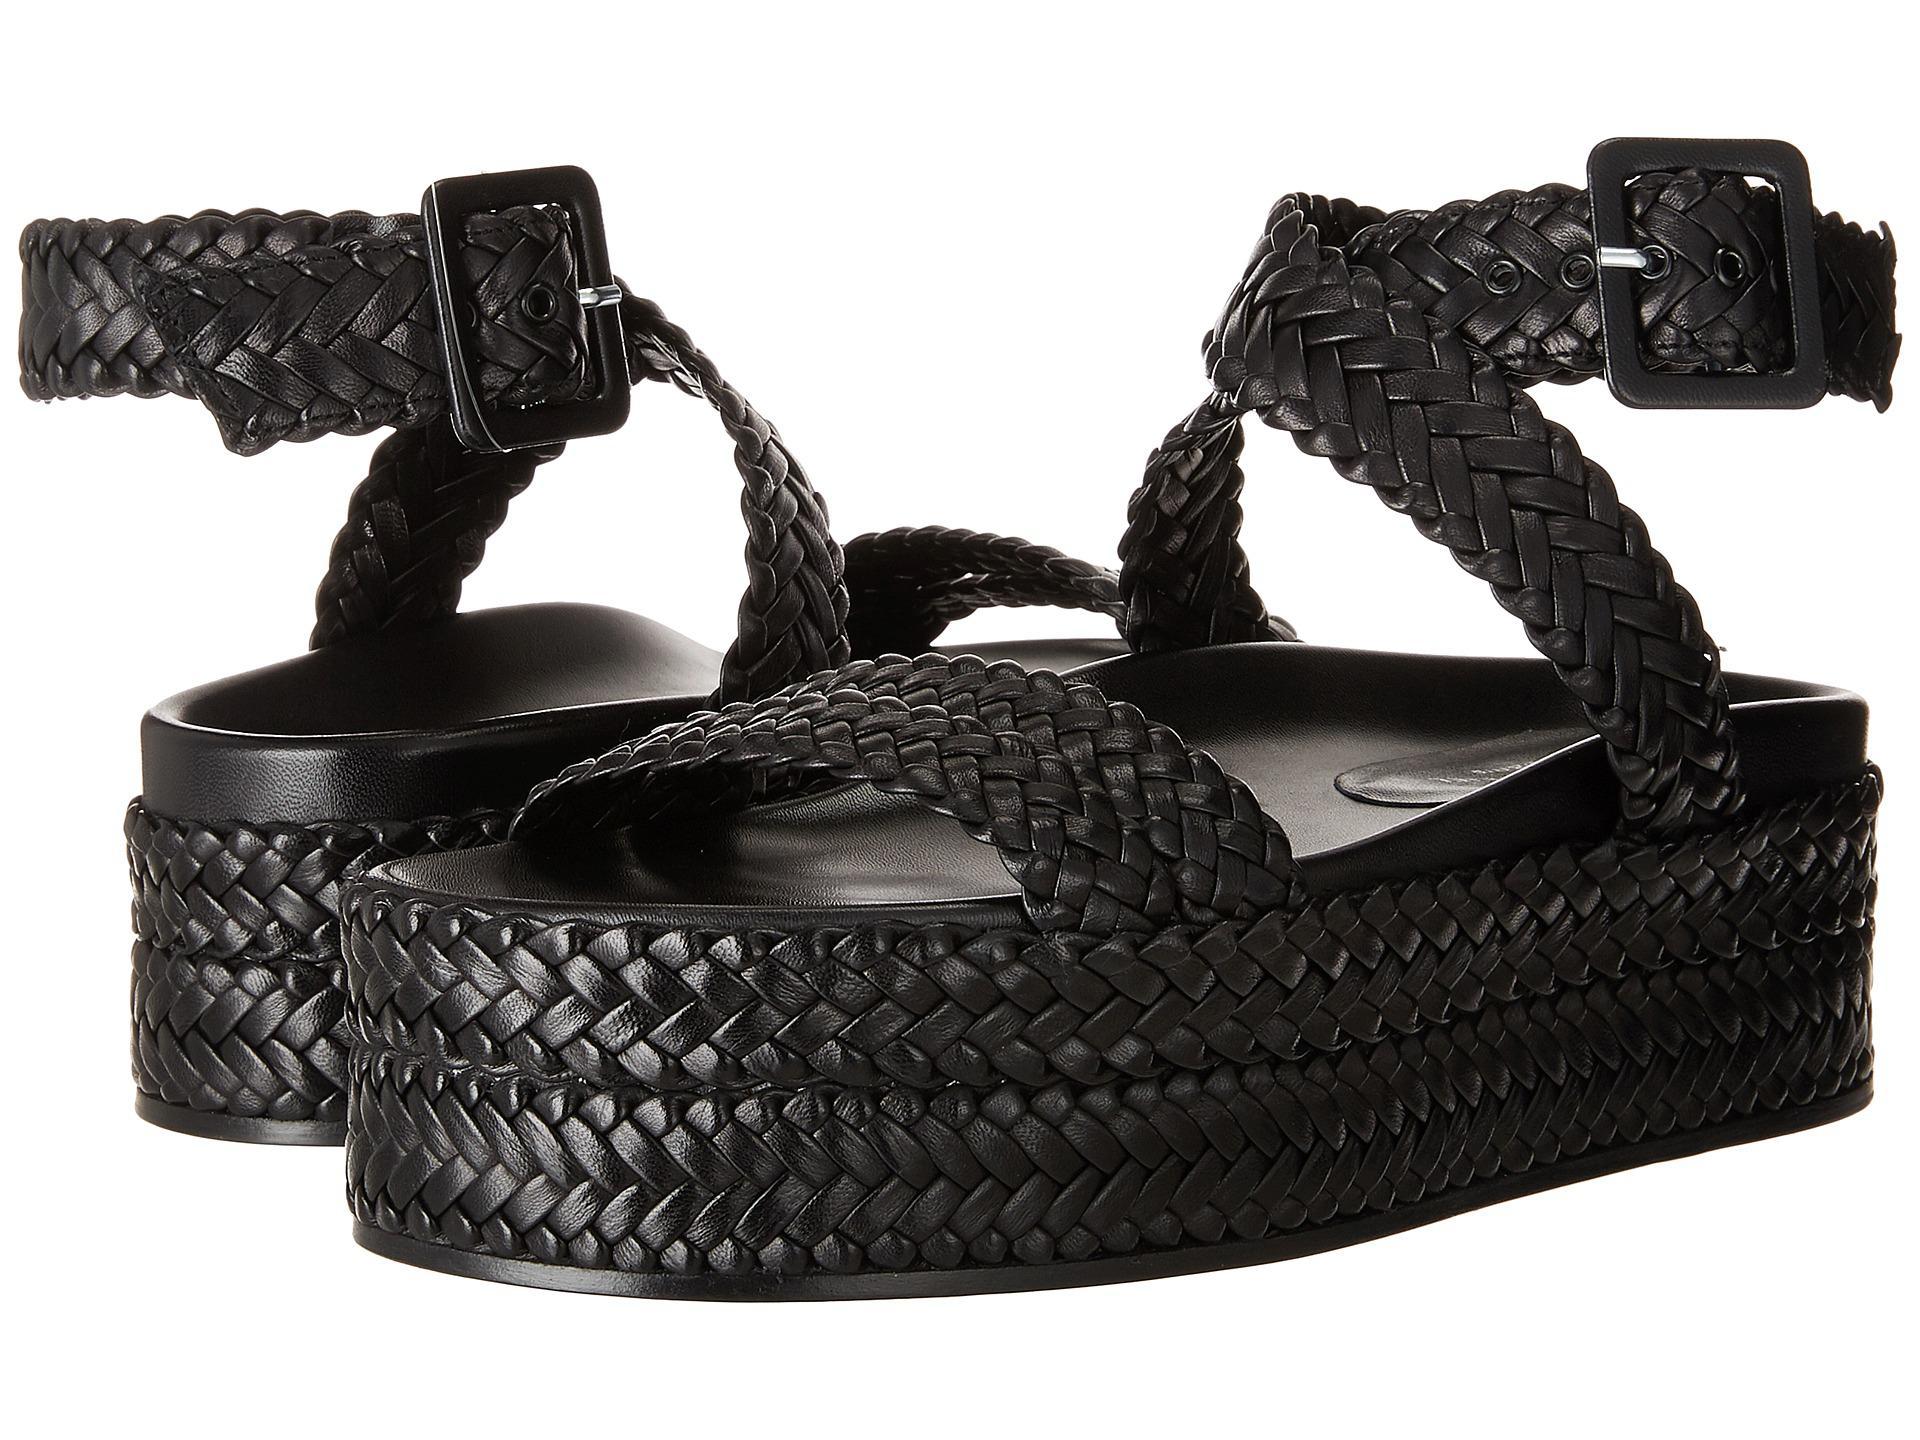 980c9a7917c Lyst - Sonia Rykiel Ankle Wrap Platform Sandal in Black